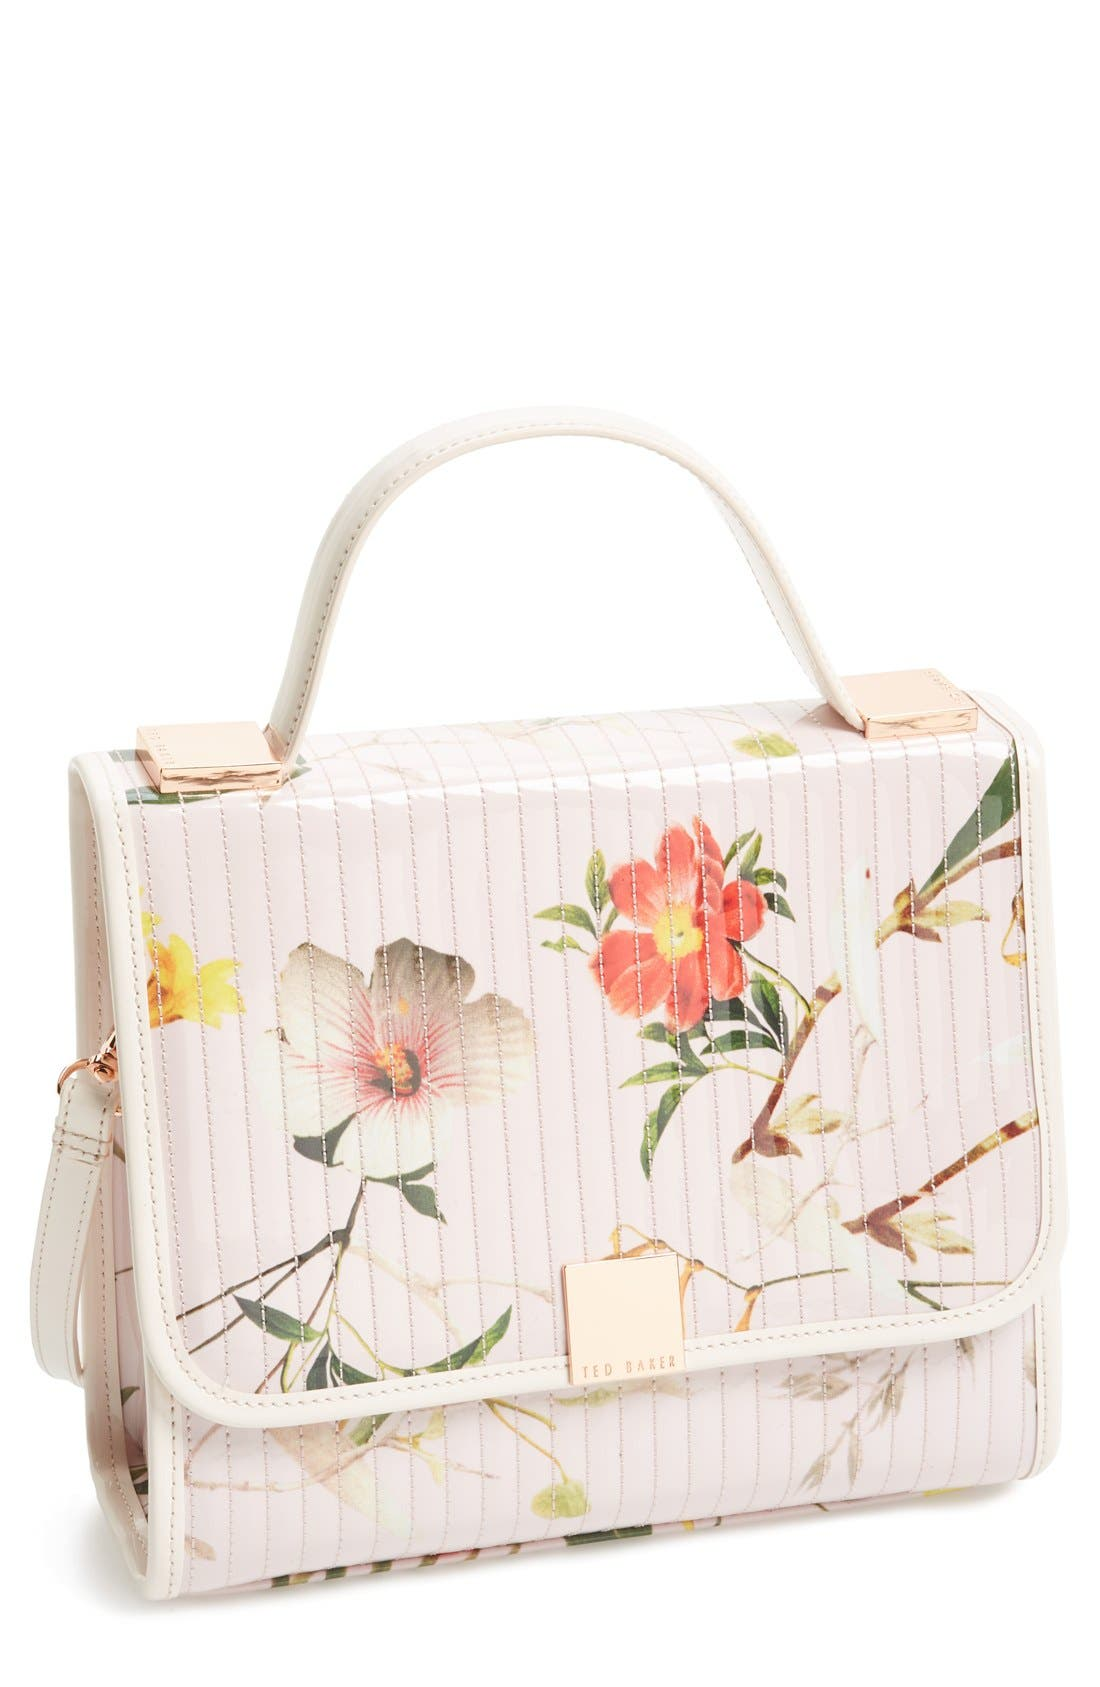 'Botanical Bloom' Crossbody Bag,                             Main thumbnail 1, color,                             Pale Pink